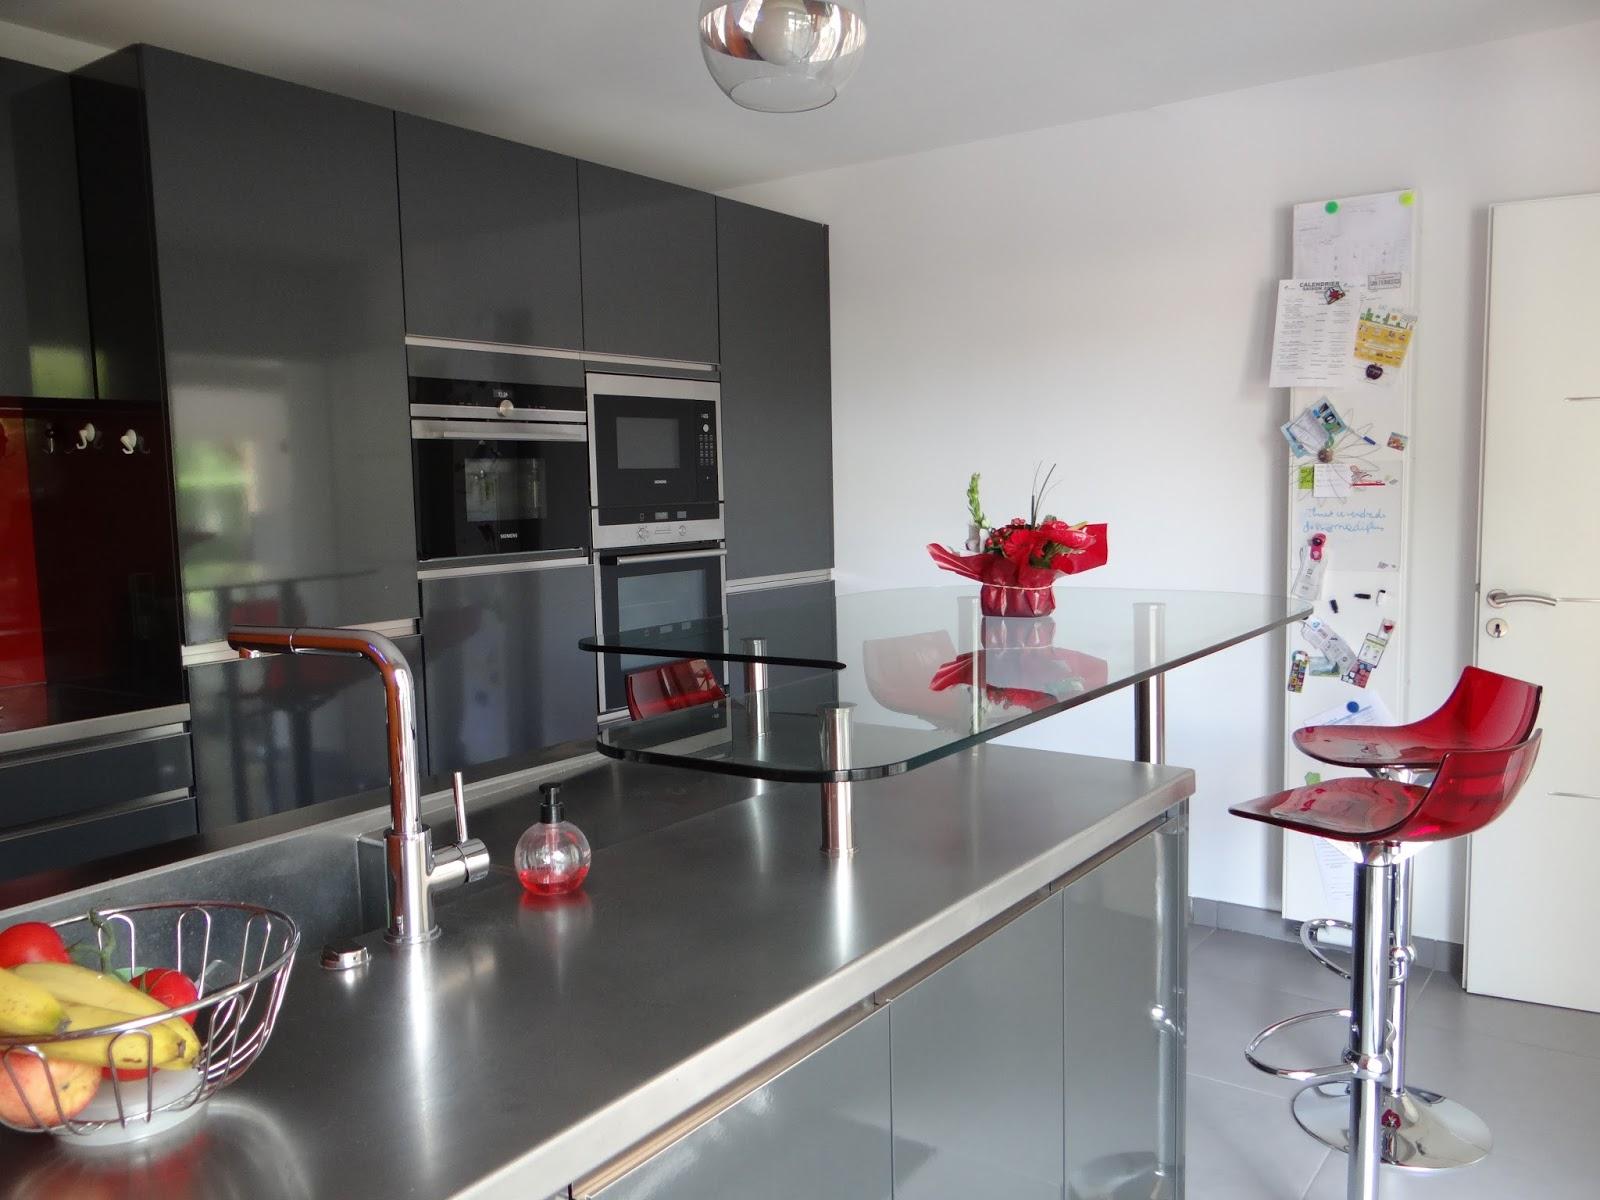 cuisine kiffa mobalpa top cuisines qui nous font rver elle dcoration with cuisine kiffa mobalpa. Black Bedroom Furniture Sets. Home Design Ideas